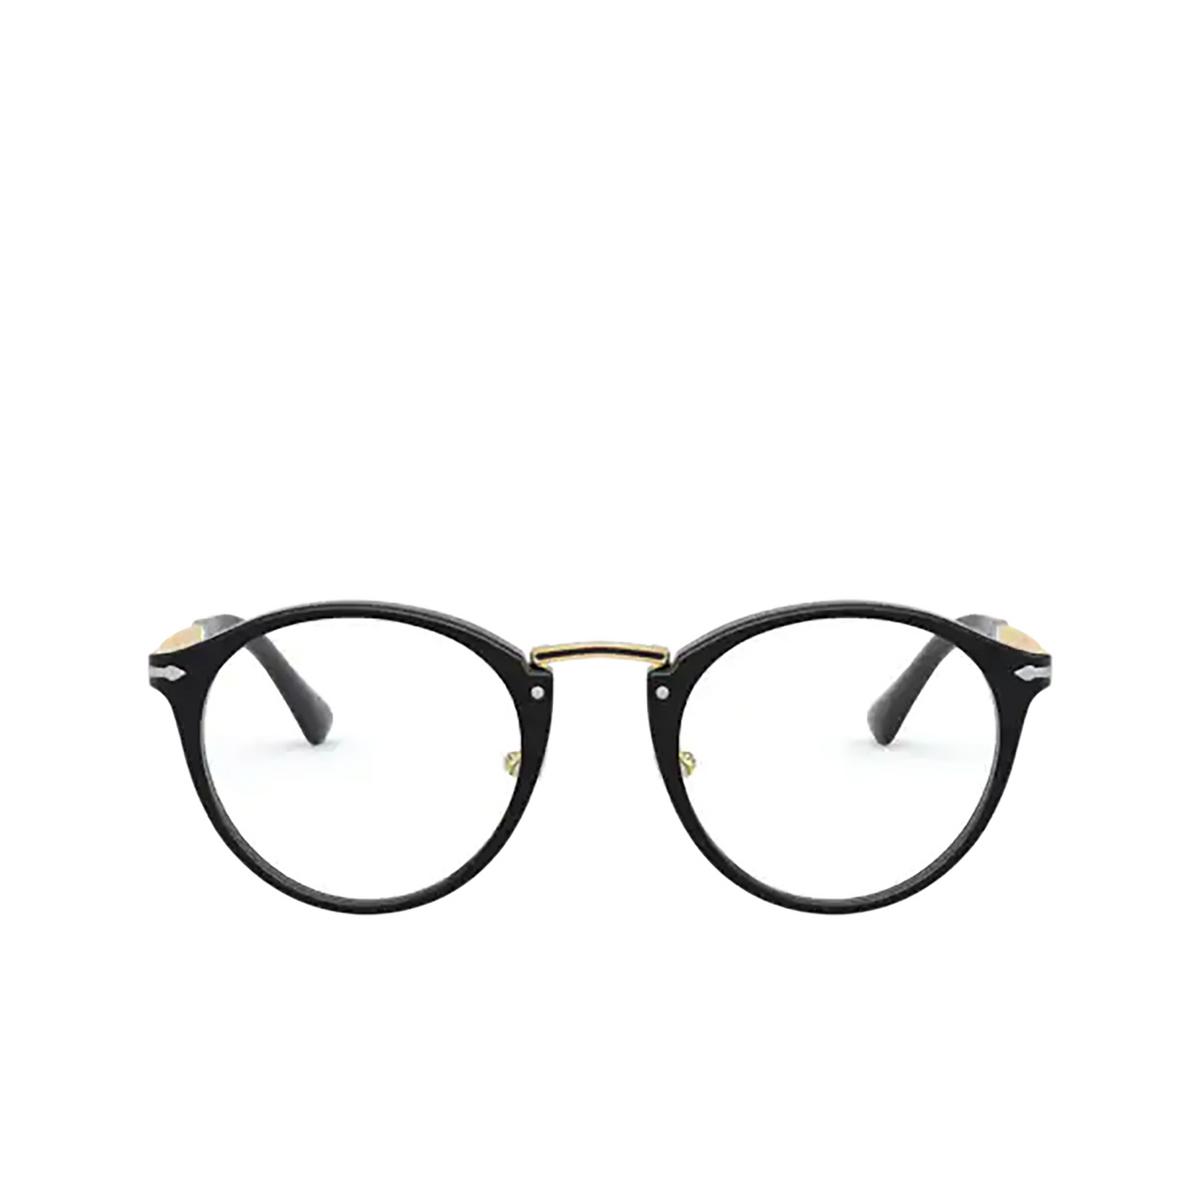 Persol® Round Eyeglasses: PO3248V color Black 95 - front view.